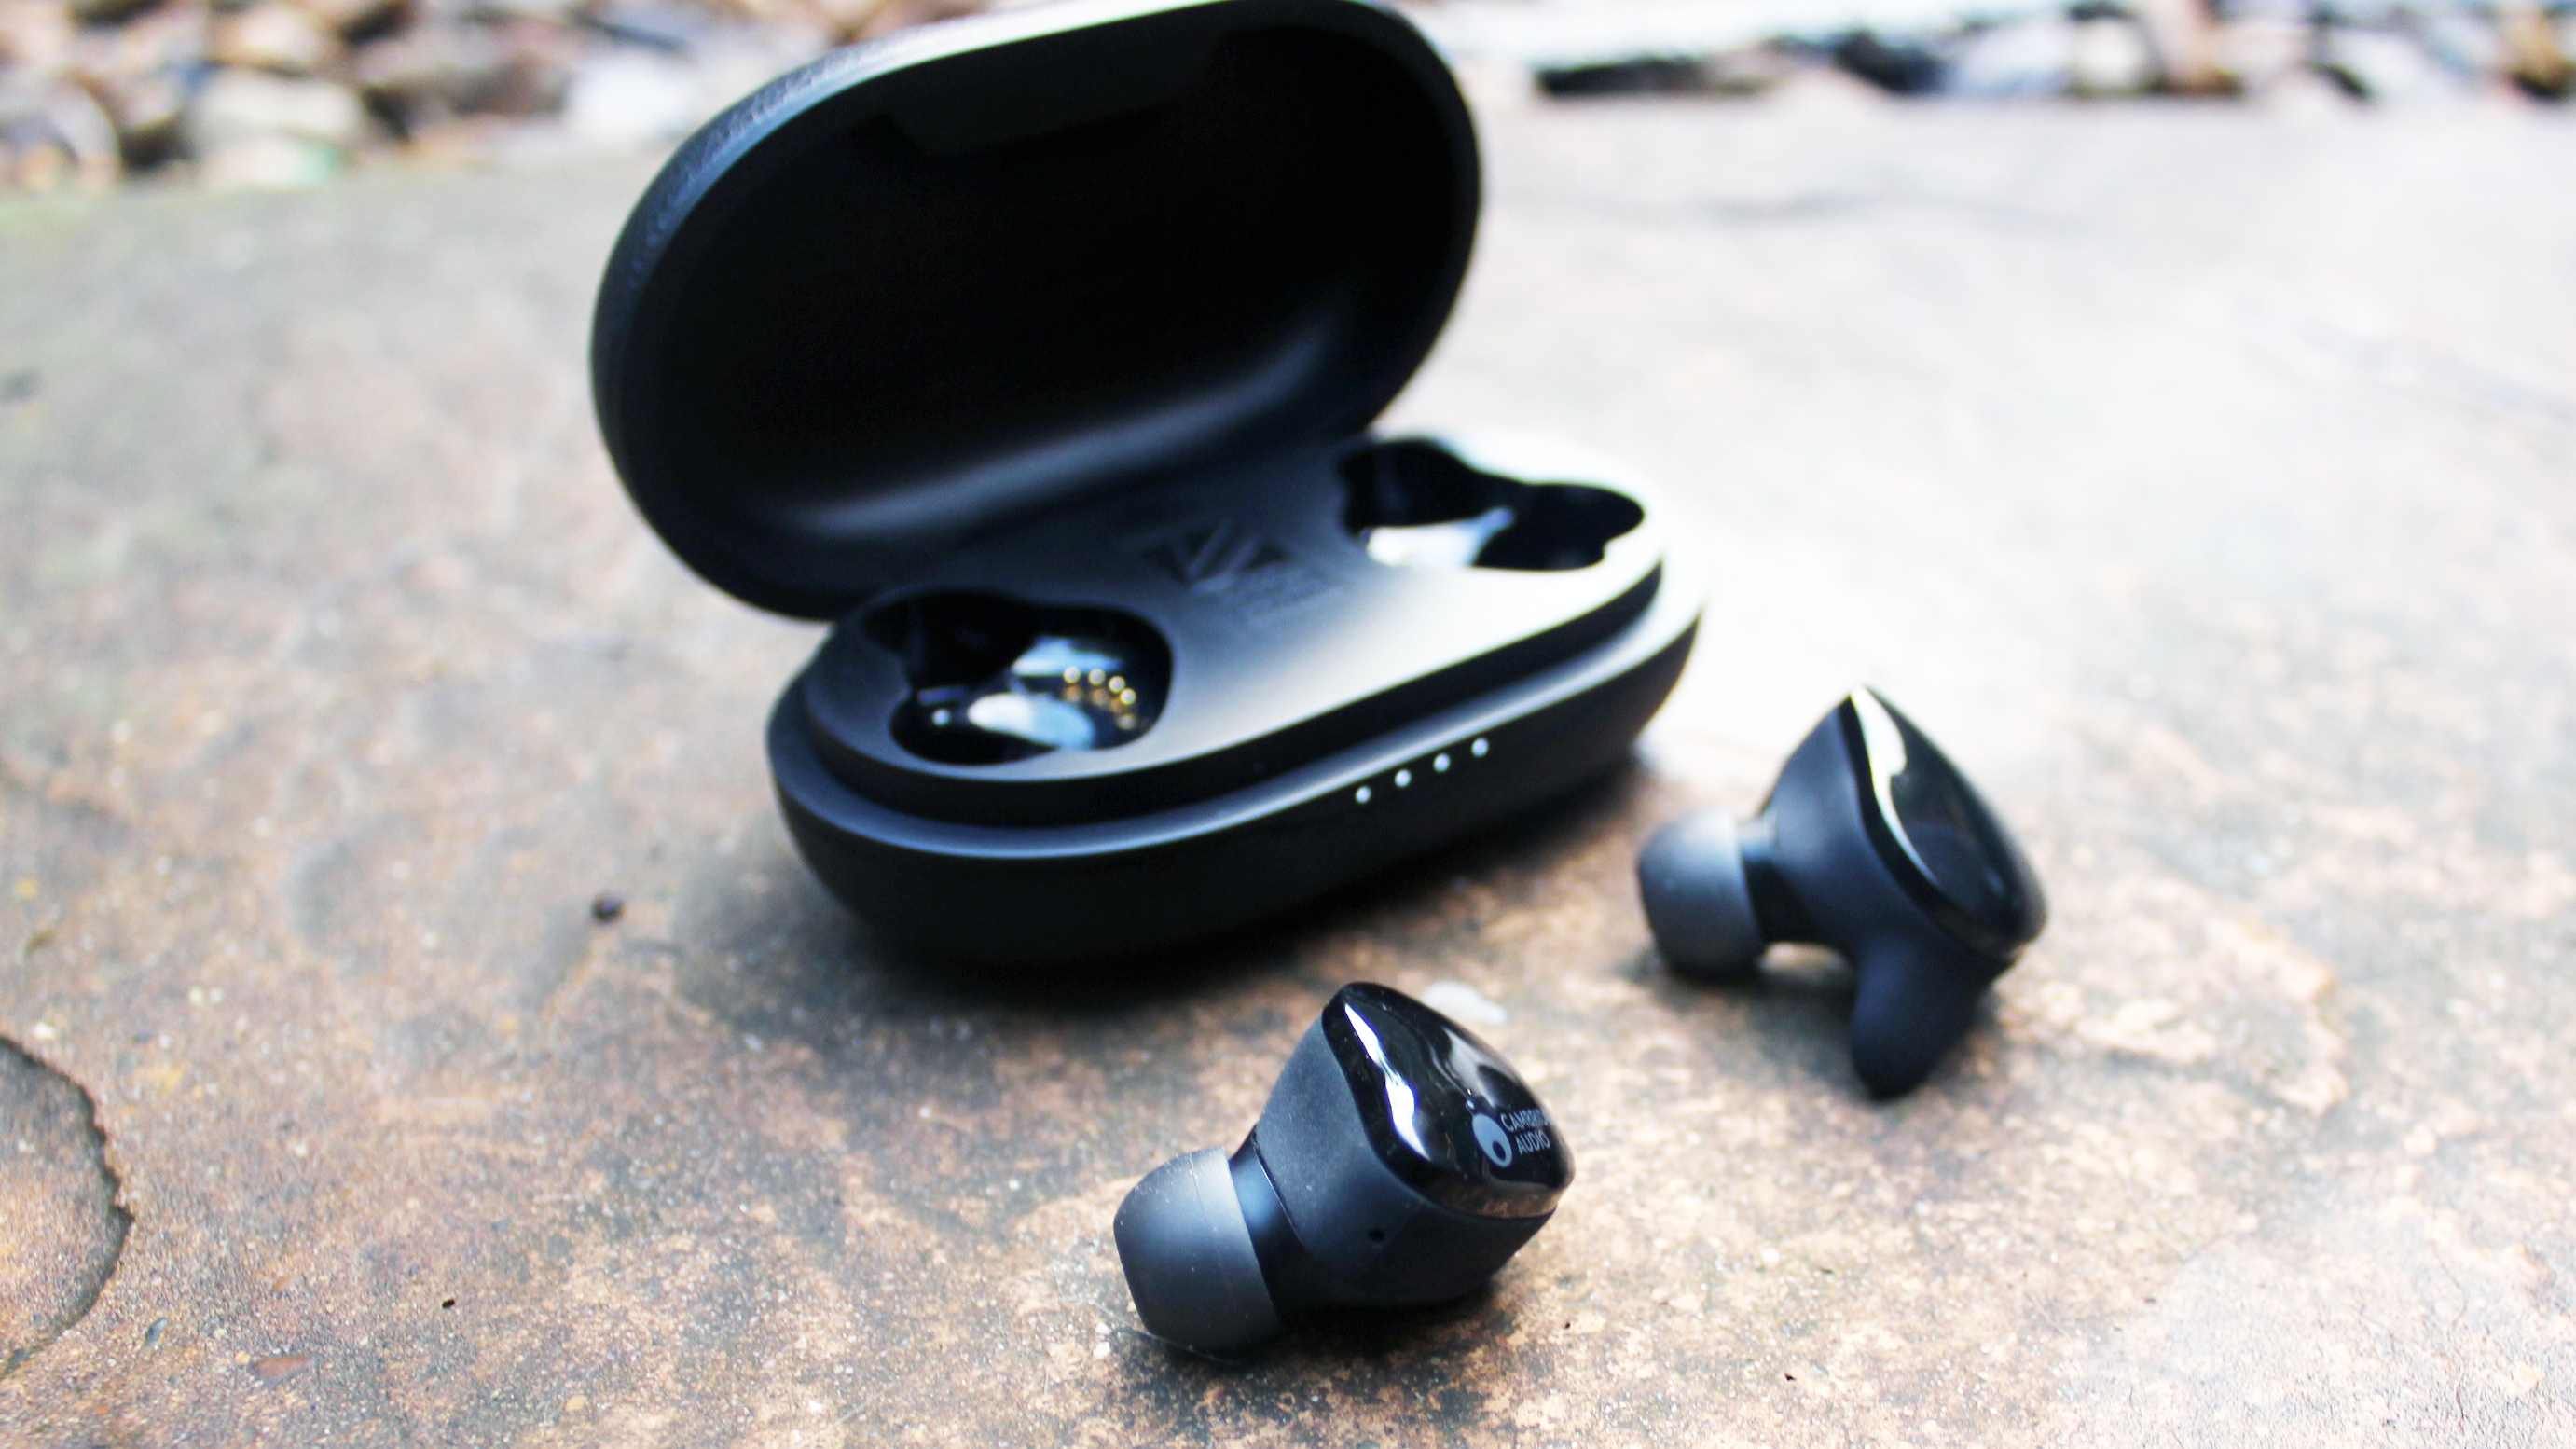 cambridge audio melomania touch review